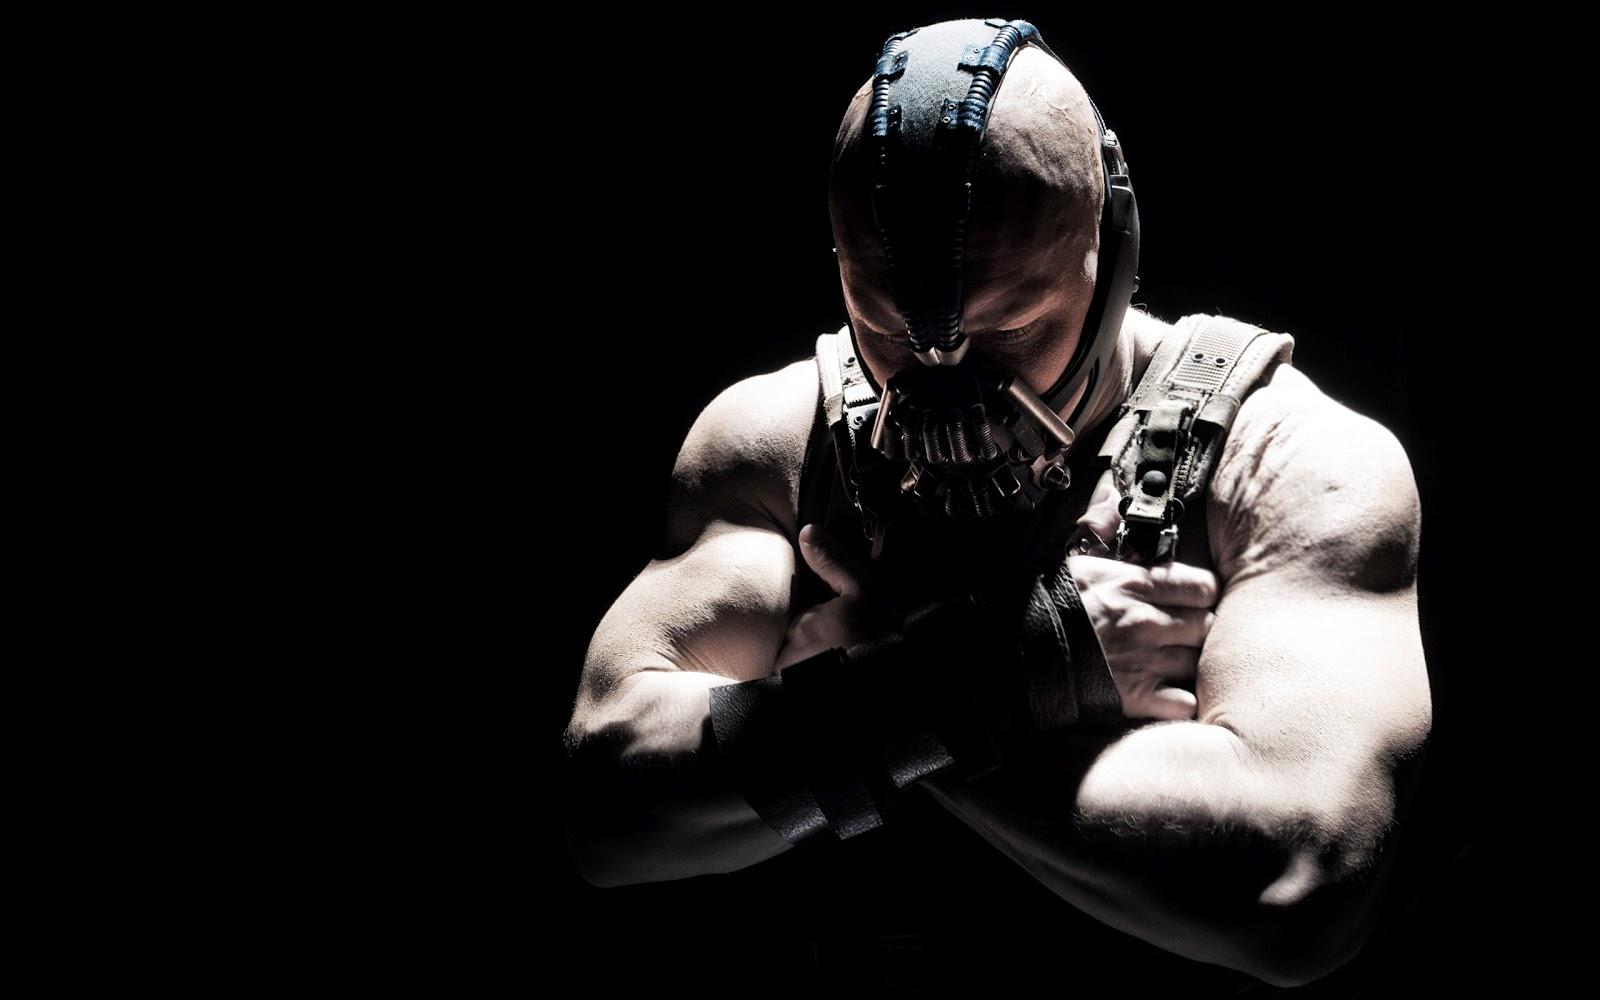 http://4.bp.blogspot.com/-0gnxU3VS_RE/UAZ9wFNqLiI/AAAAAAAAD68/7pGdPzW-0G8/s1600/Bane-the-dark-knight-rises-30411120-2560-1600.jpg